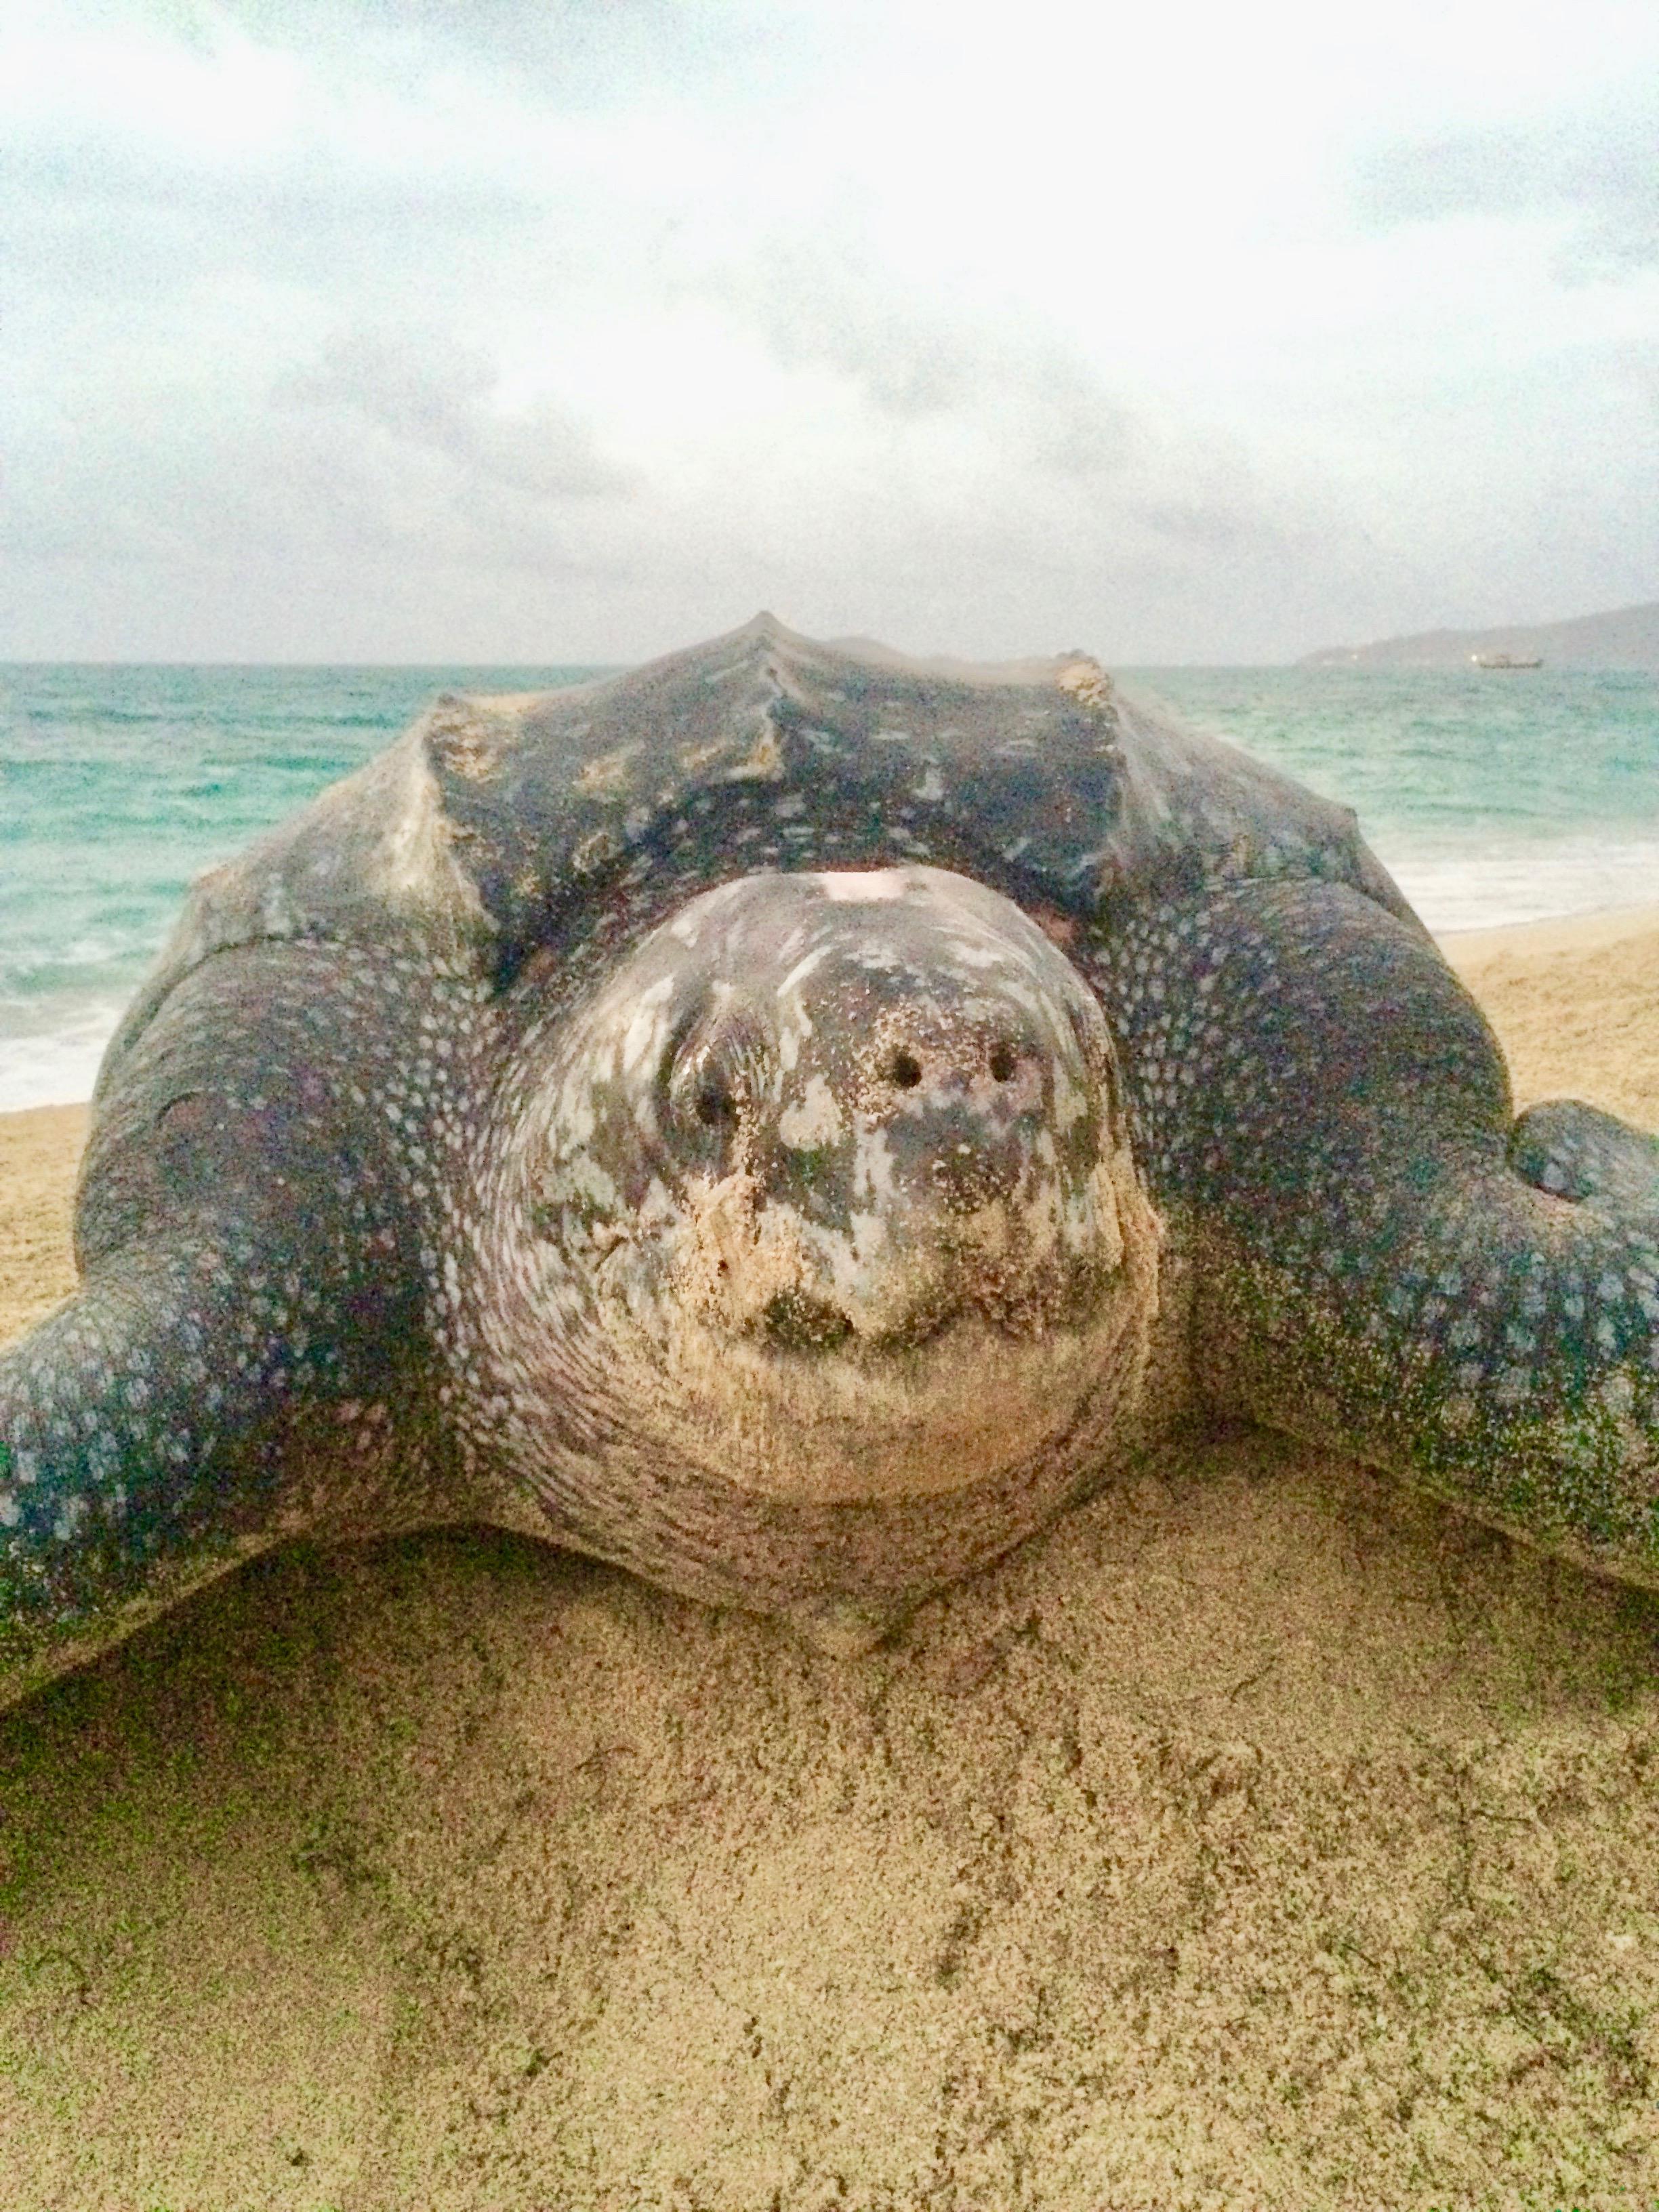 Post-nesting Leatherback in Petit Carena